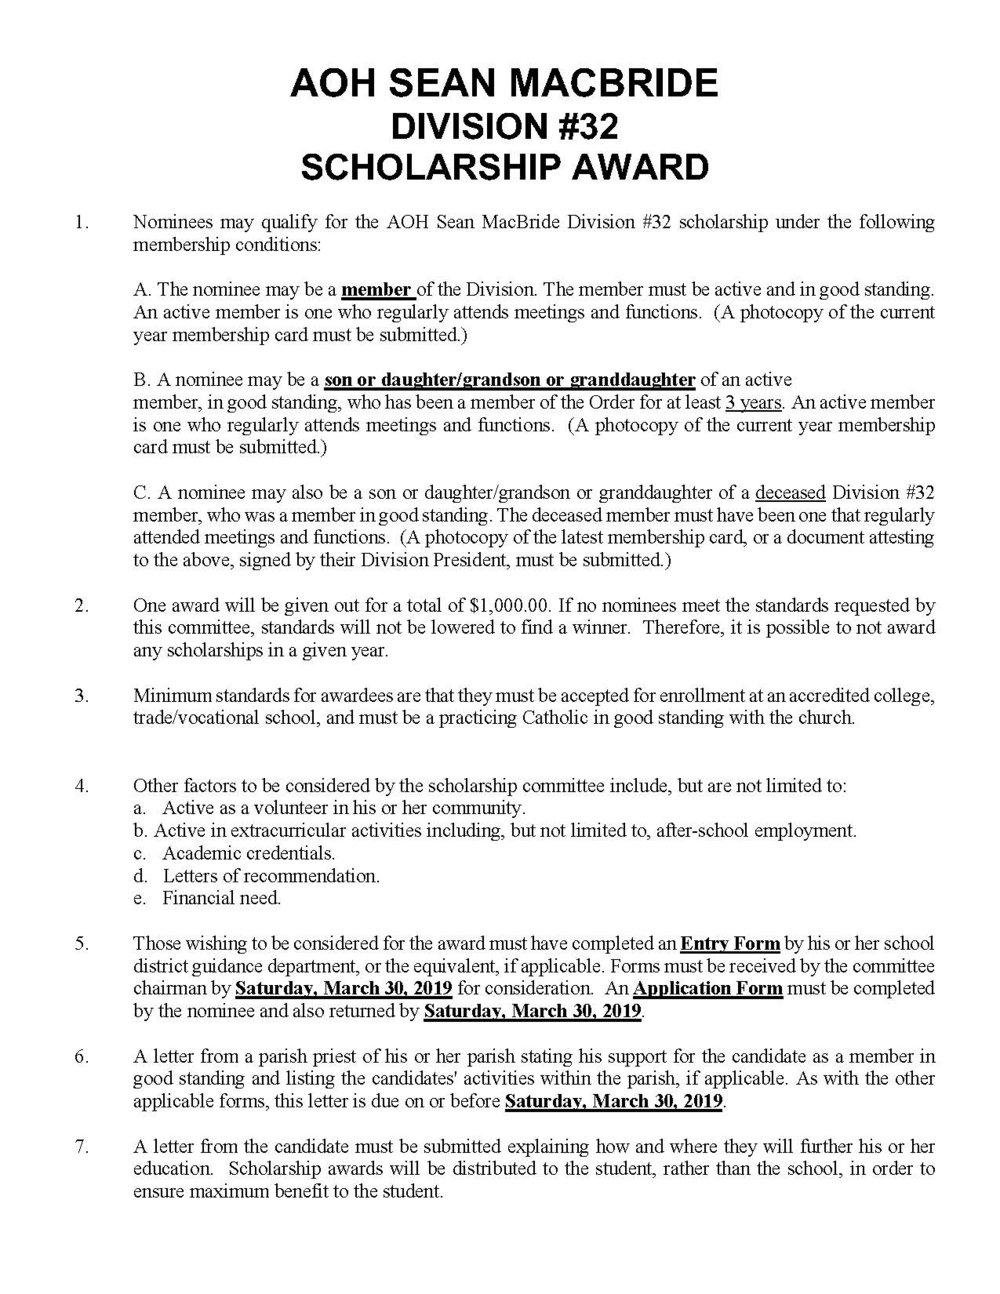 Scholar_qualifications_2019.jpg